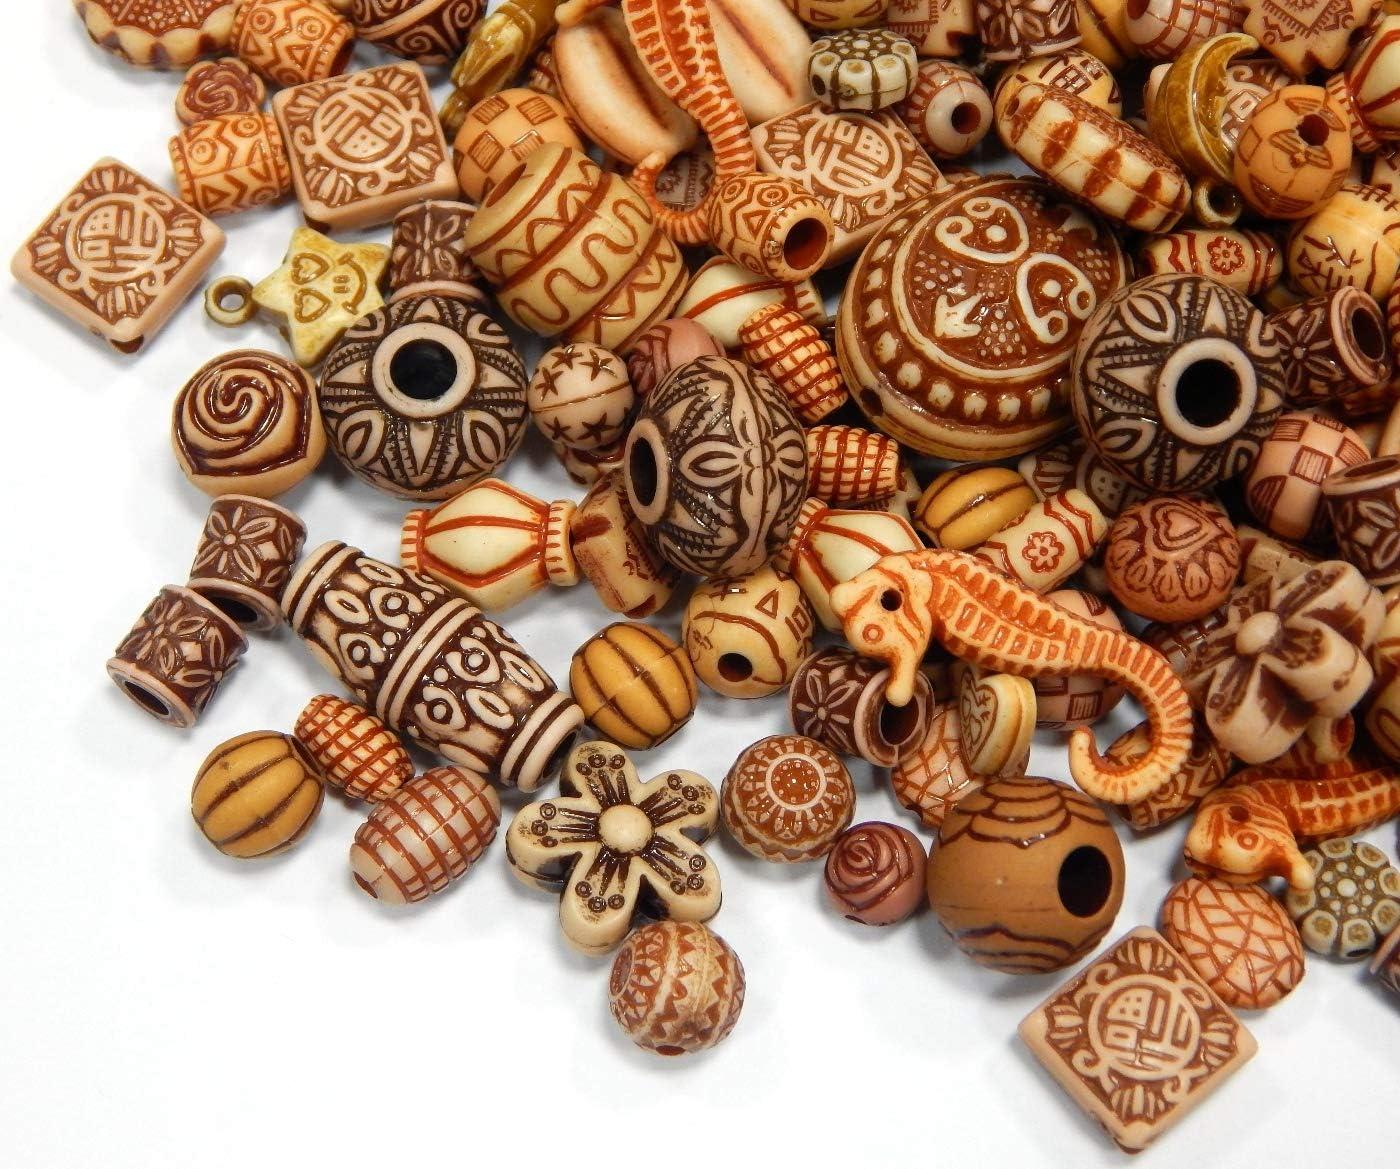 Juego de 50 g de Perlas de plástico de Tibet Antiguas, Perlas de plástico de Colores Variados, Perlas acrílicas para Collares, Pulseras, Collares, Juego de Manualidades D123